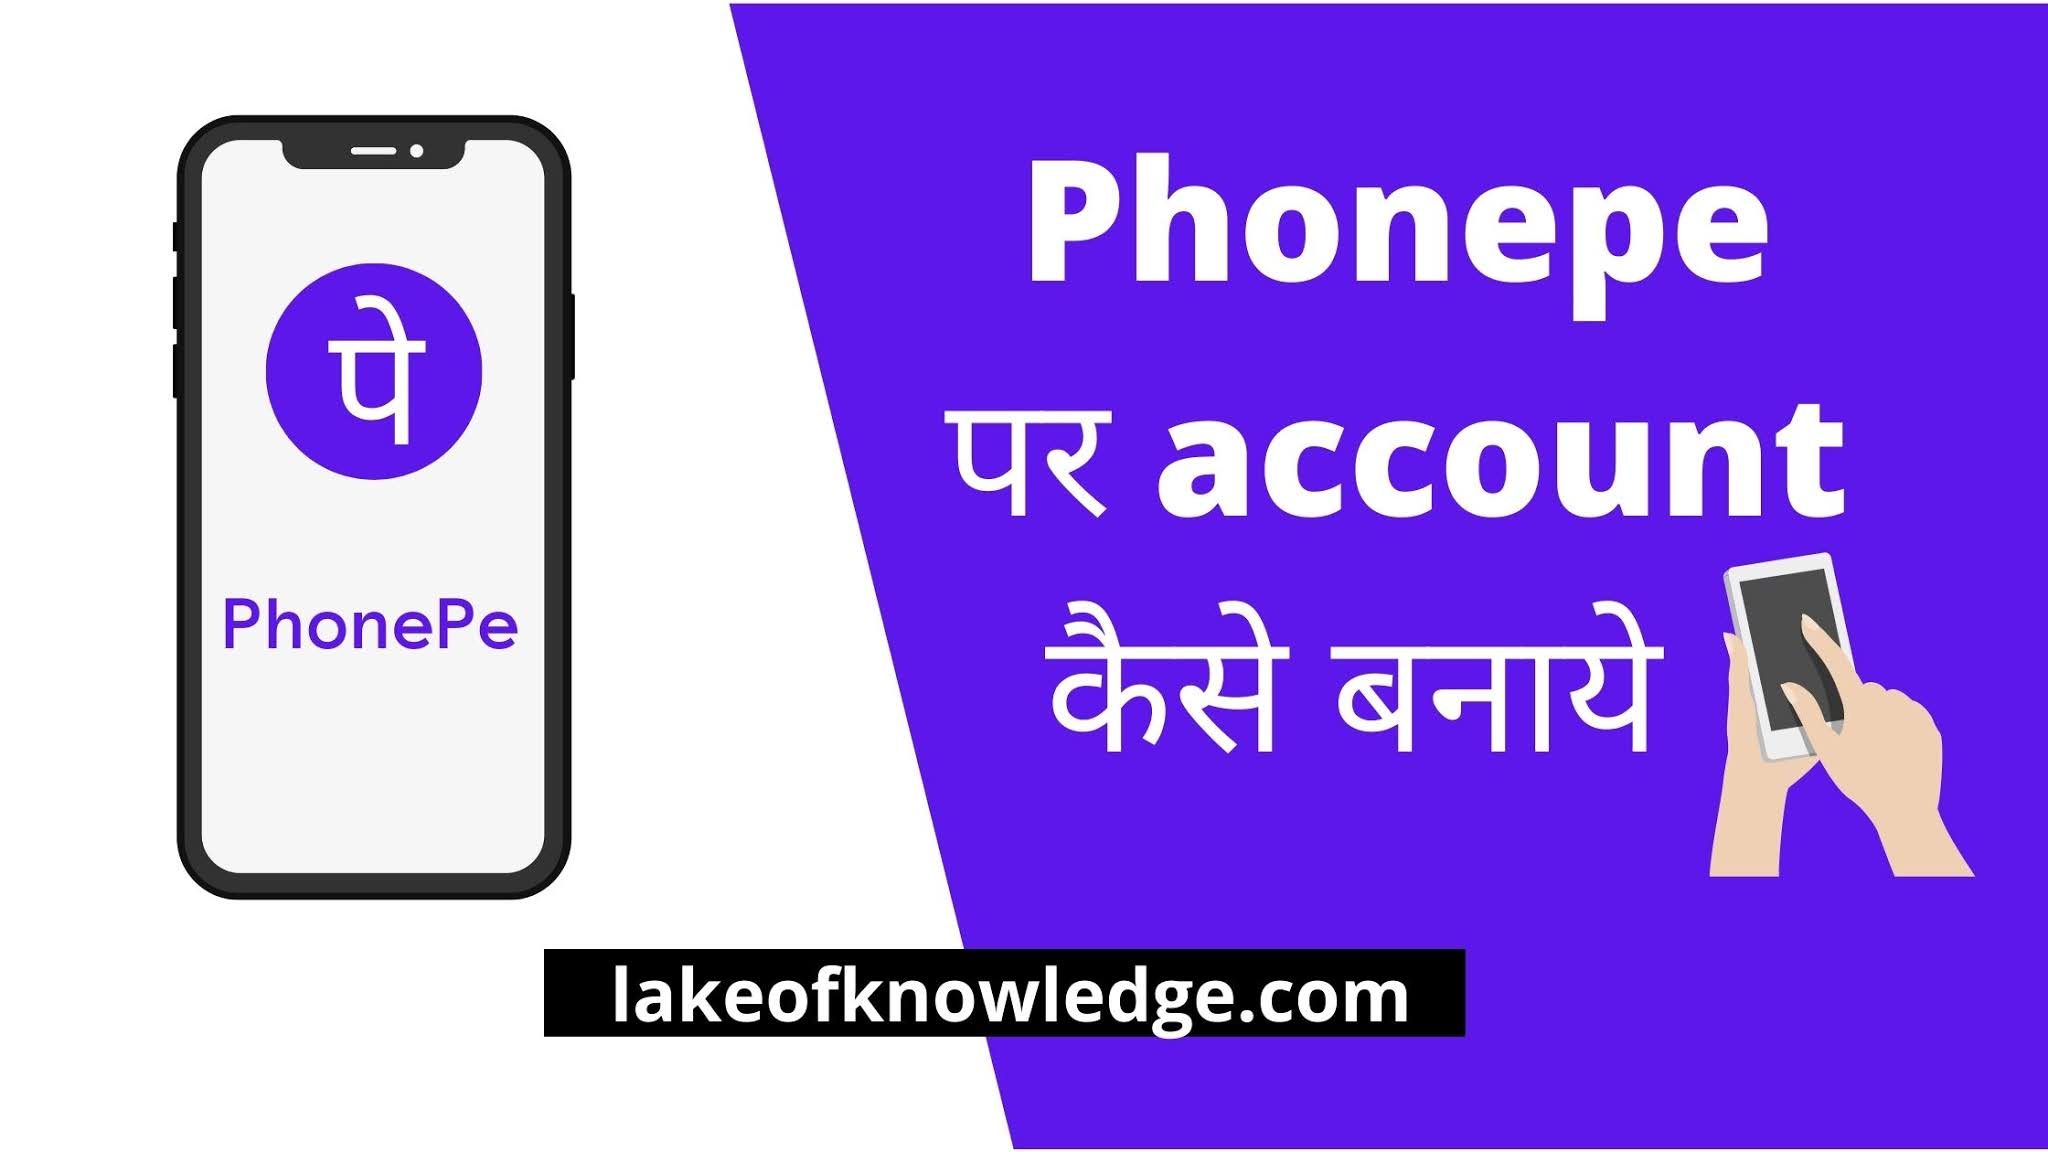 Phone pe par account kaise banaye